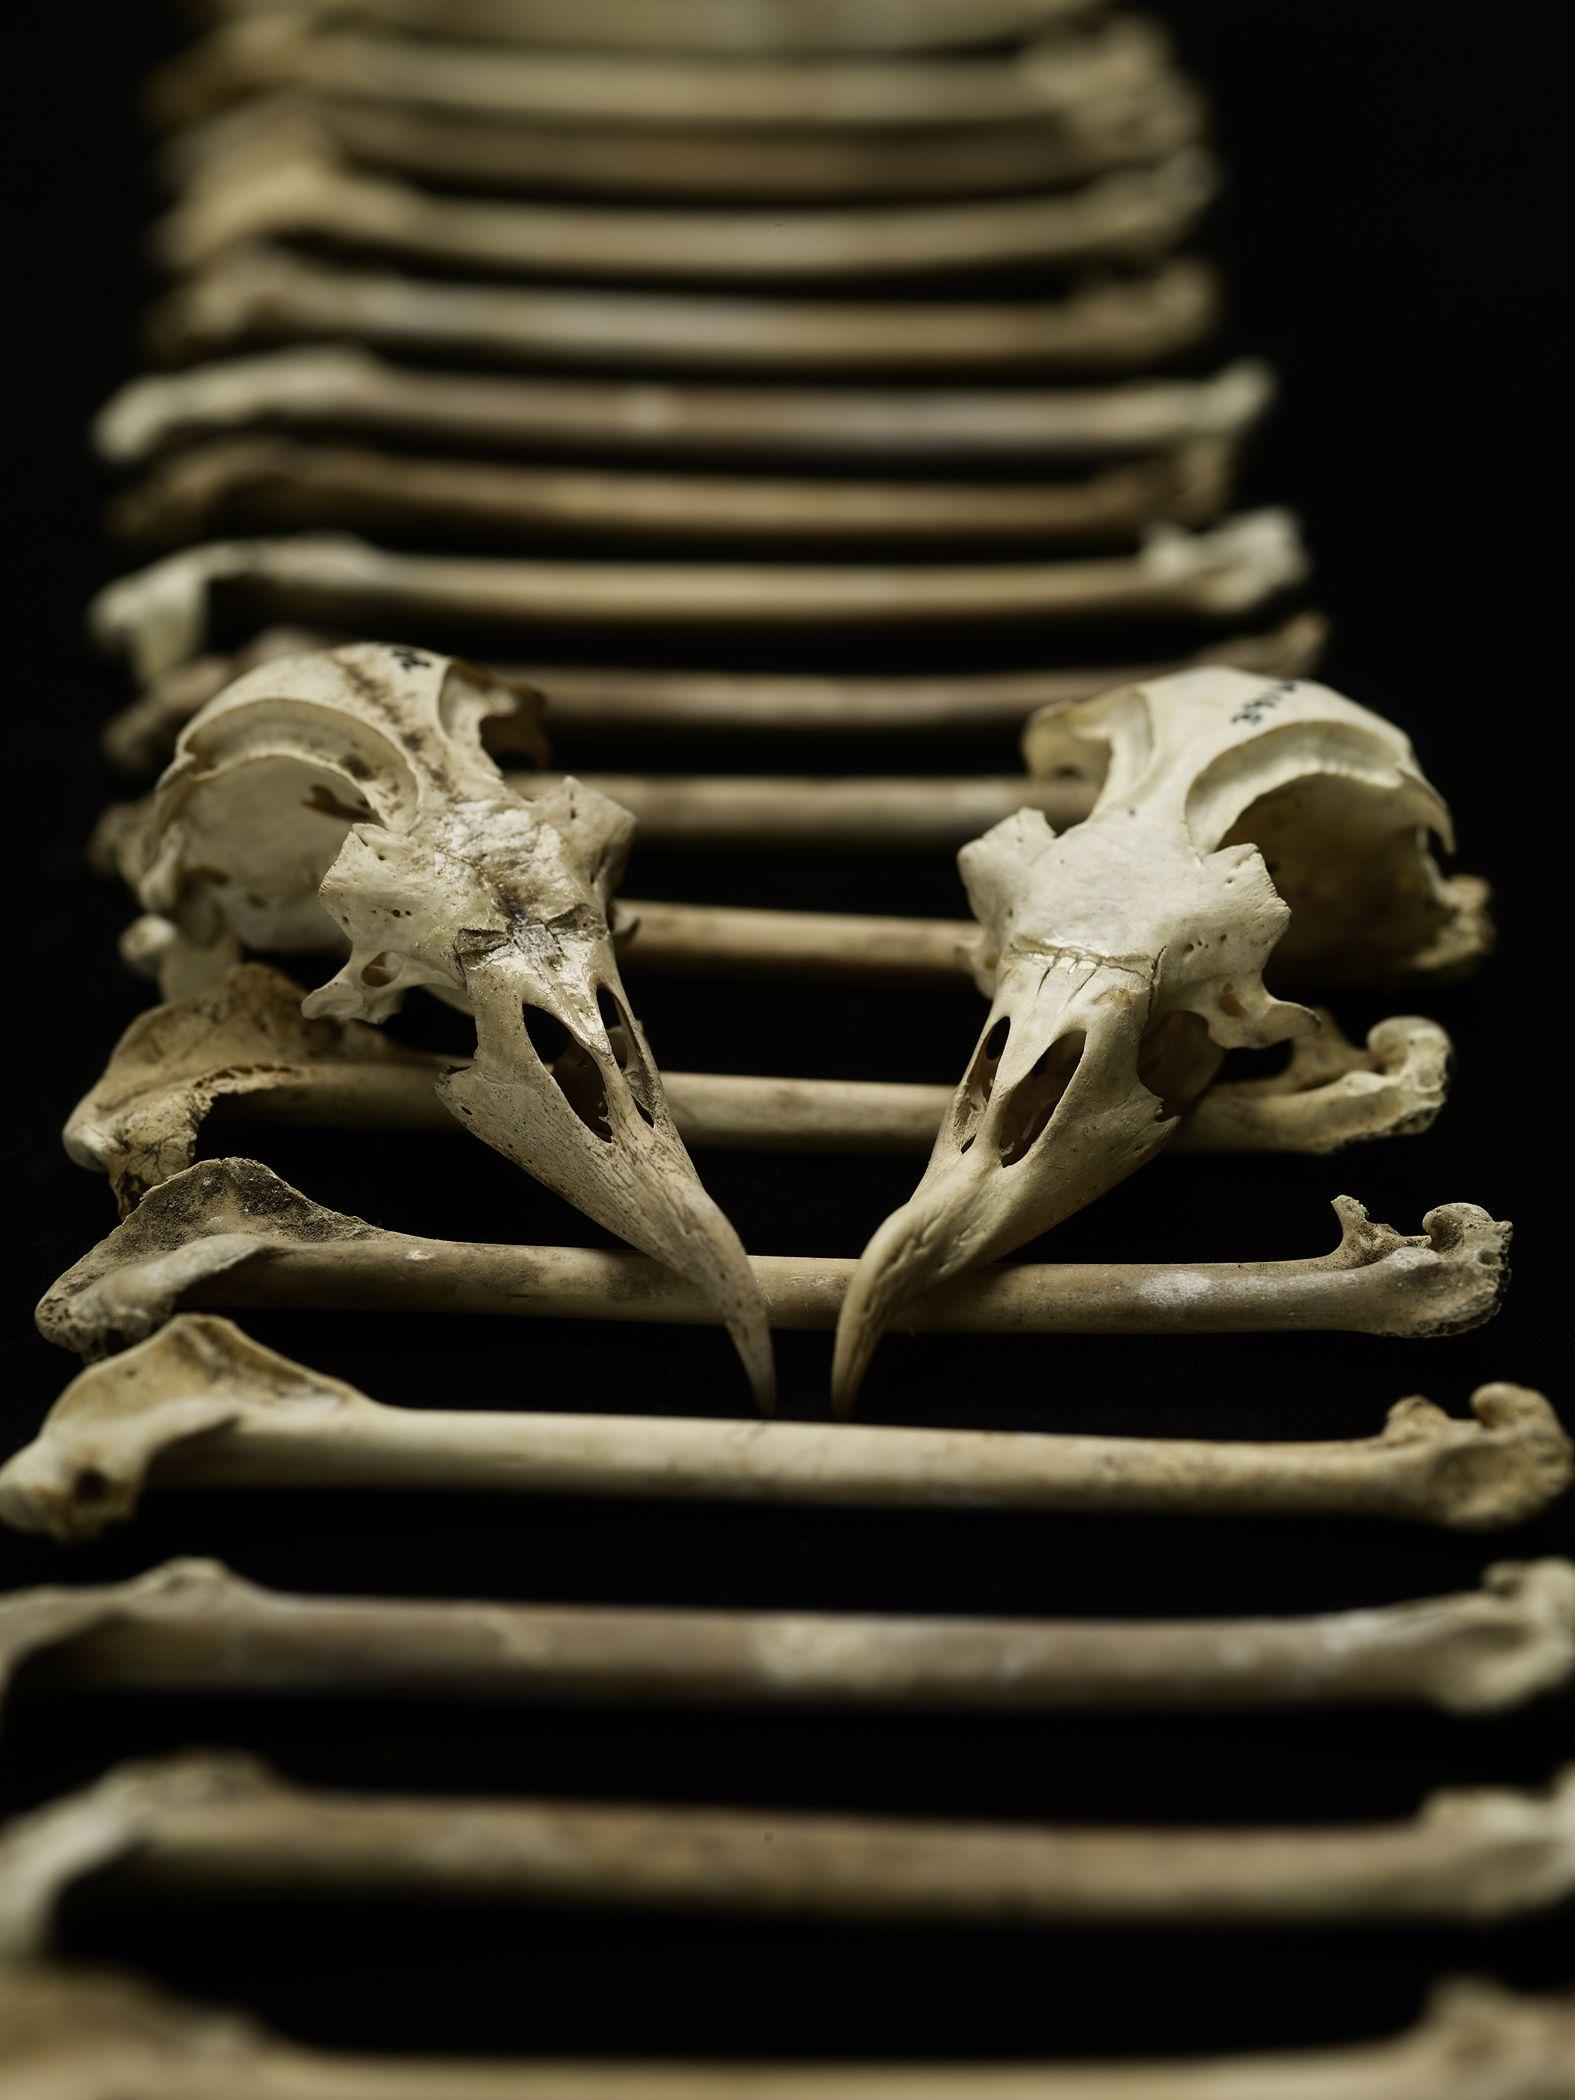 Bird Bones Reveal Human Effects On Ocean Food Chain